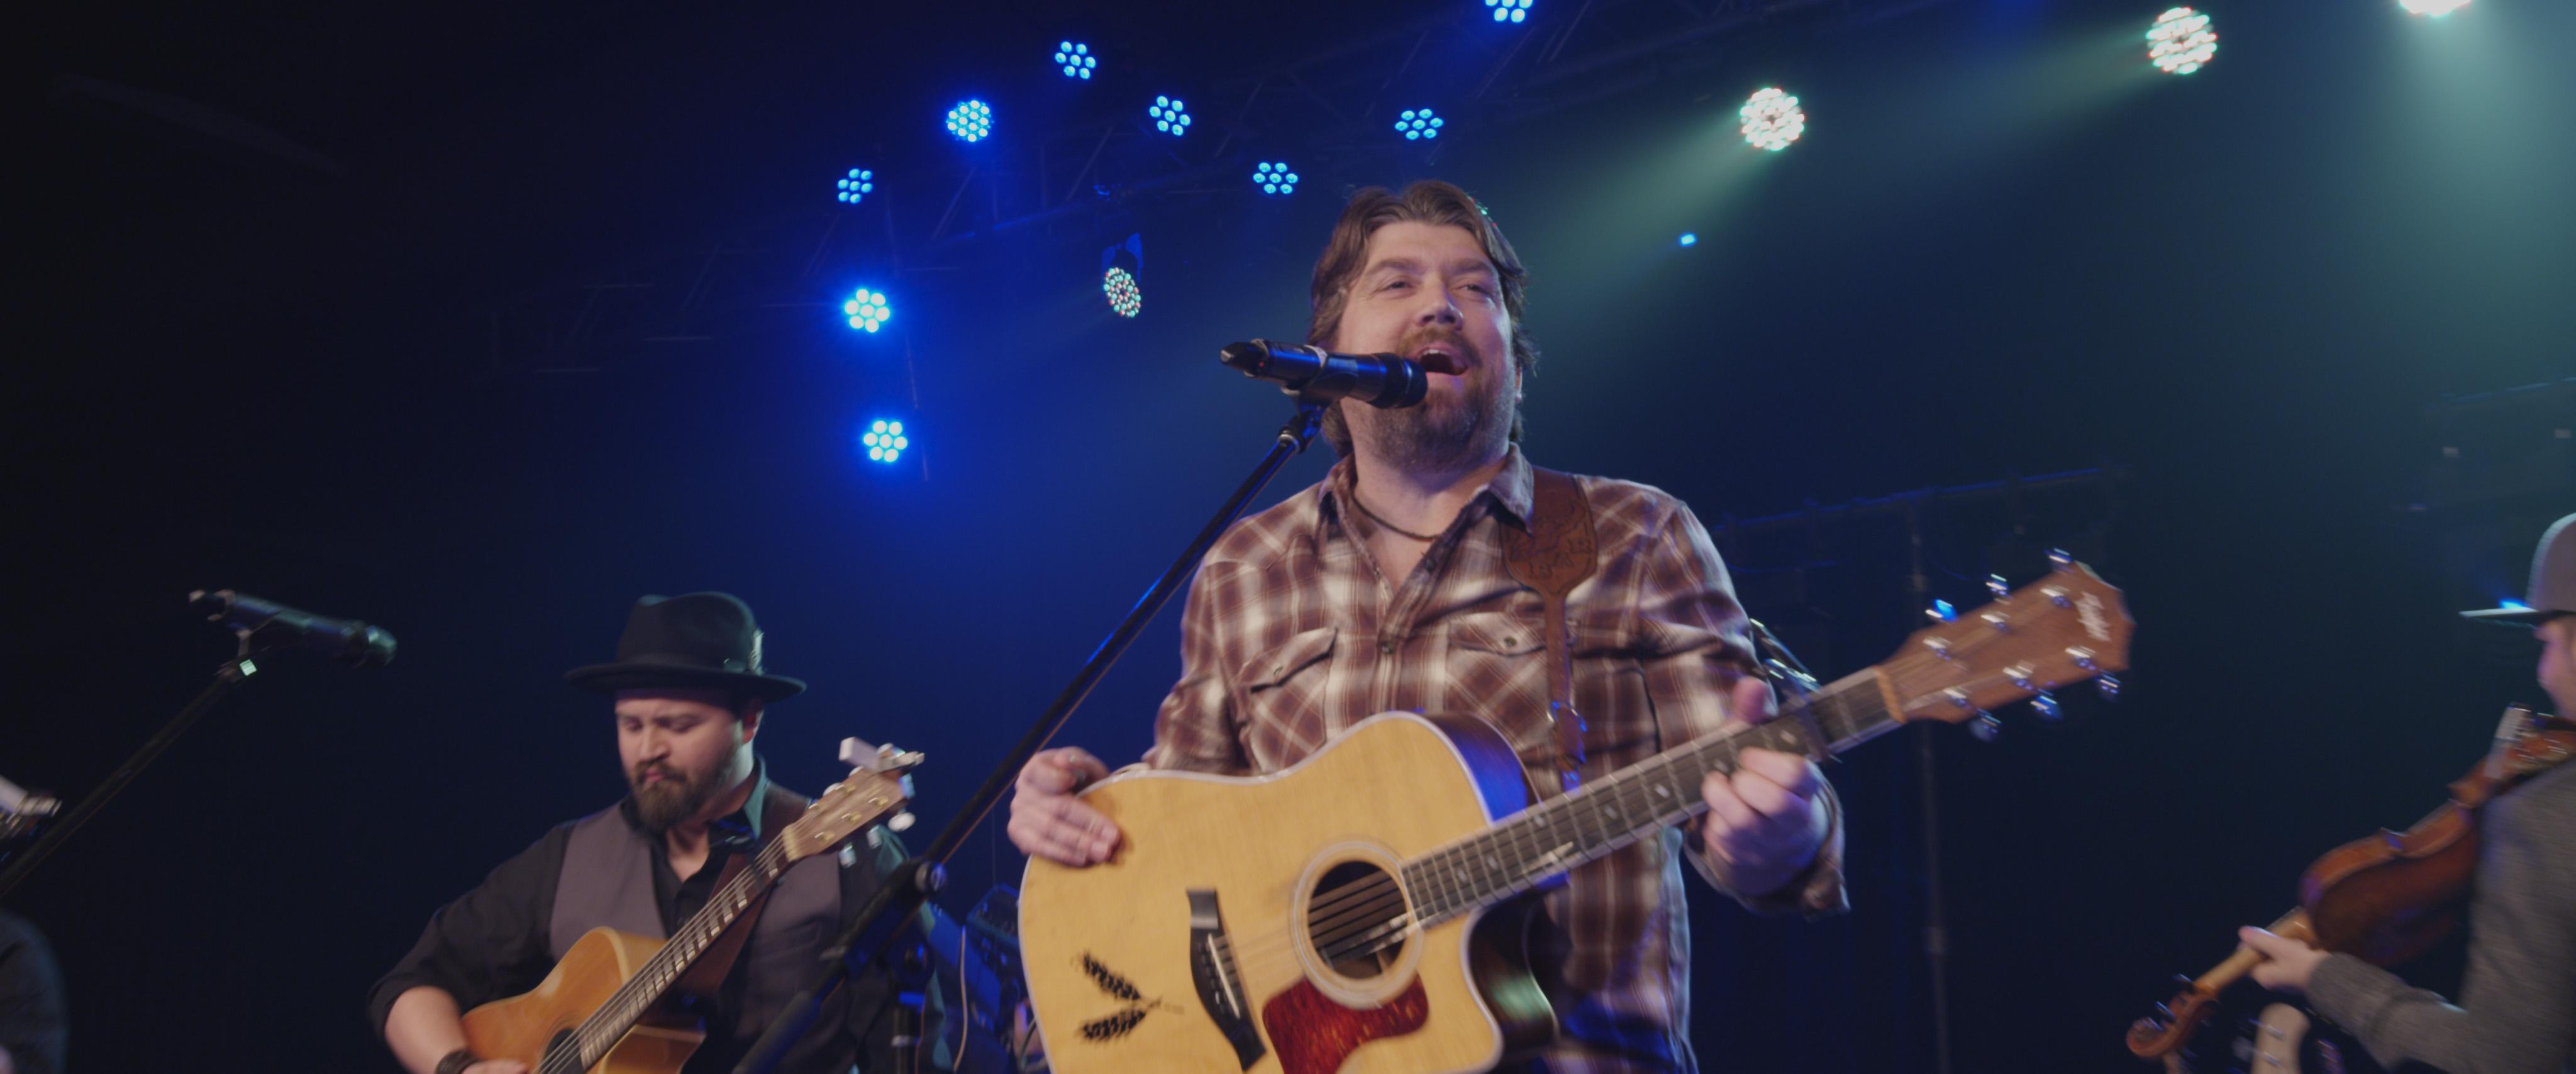 Blake Reid Band - 2017 ACMA's 19